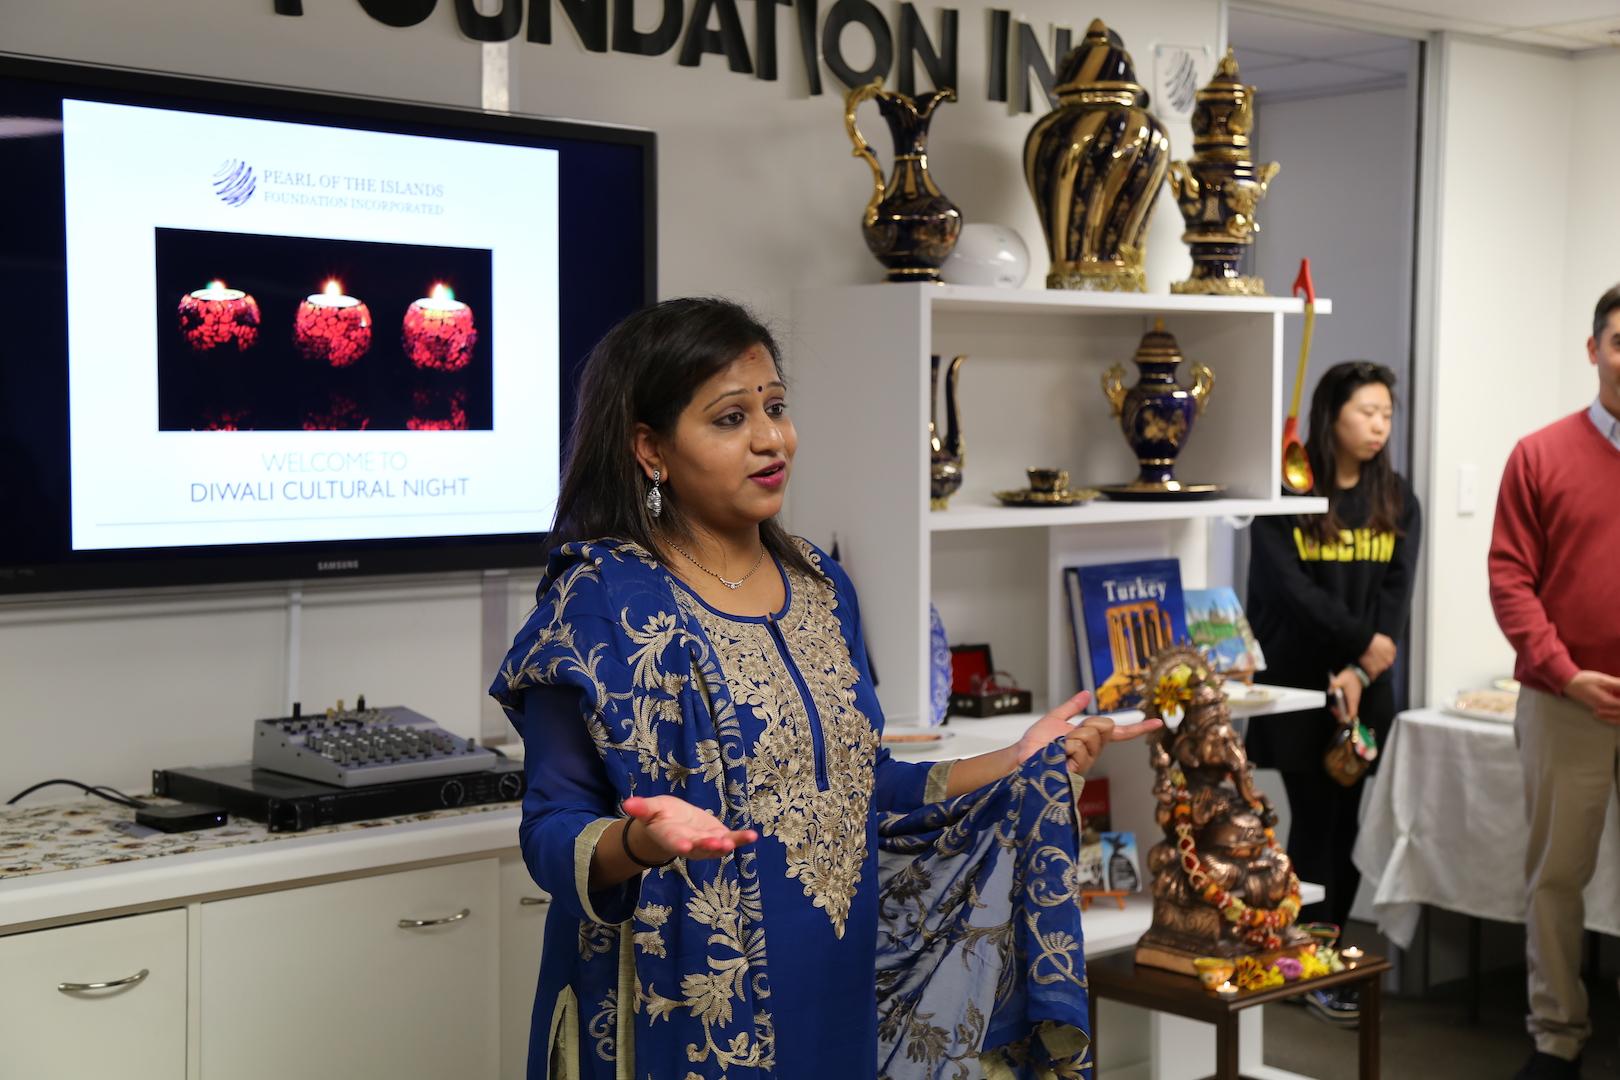 Diwali Cultural Night